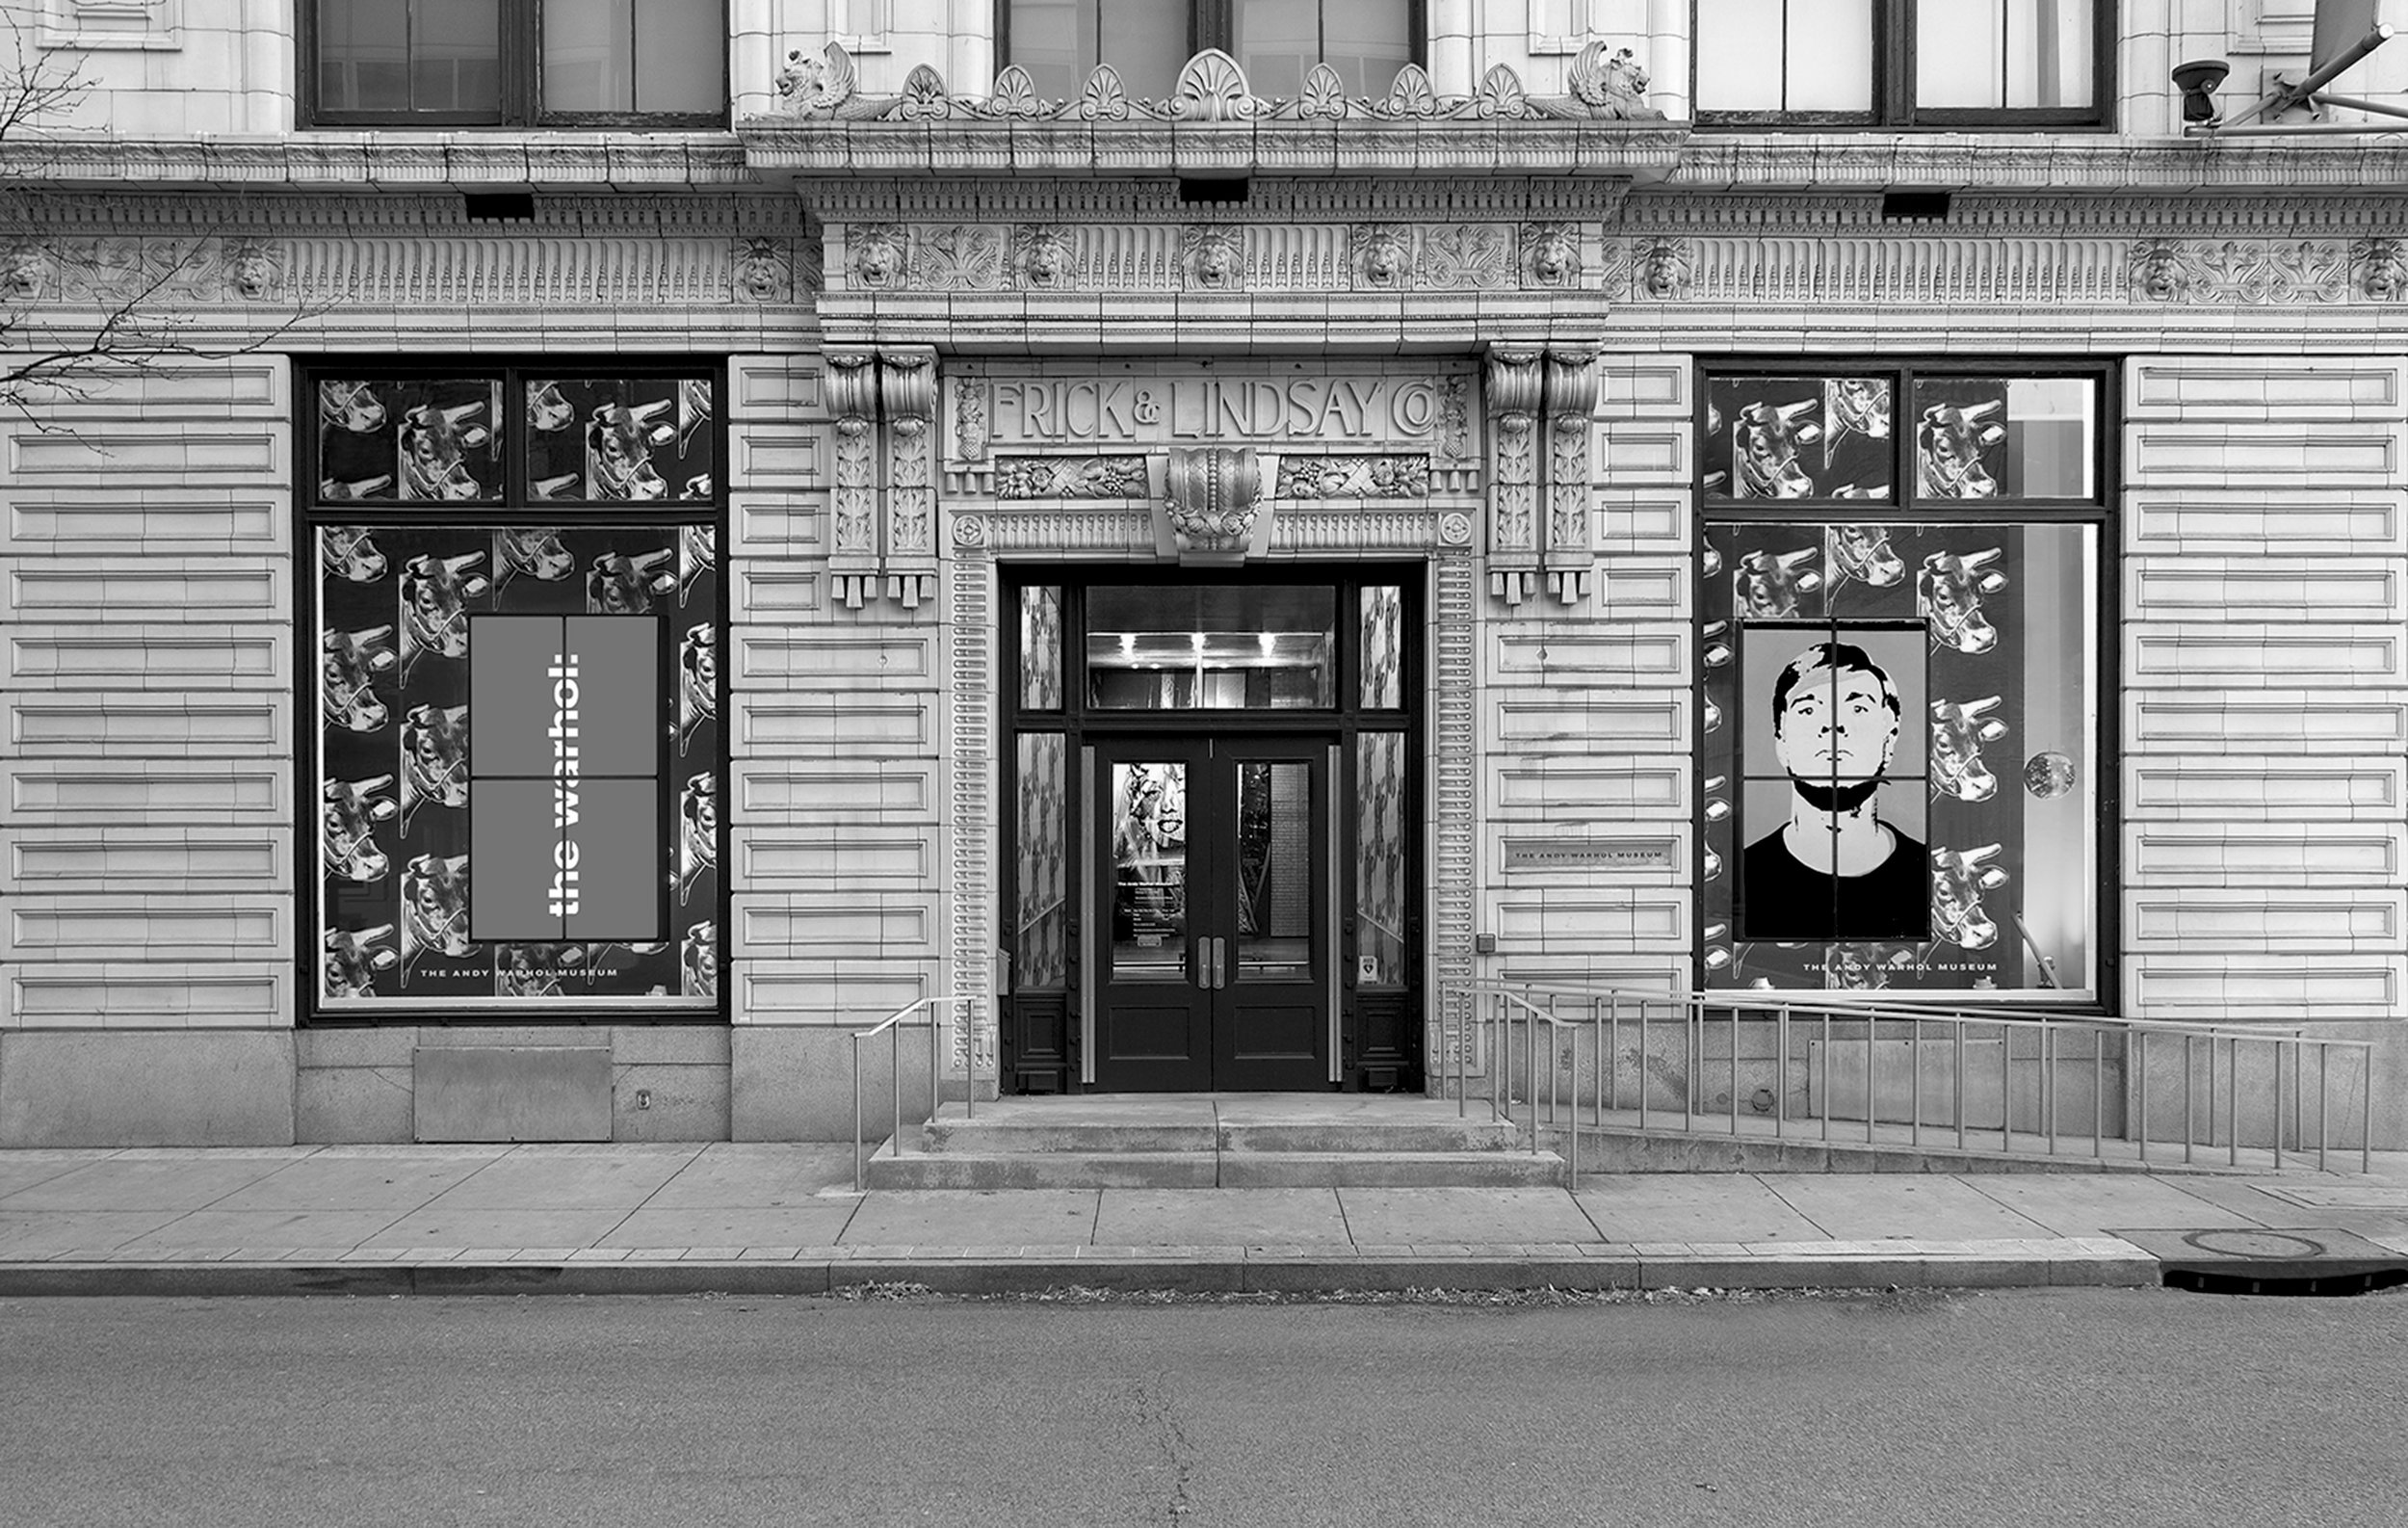 ©-Abby-Warhola-2013-museum-facade-1.jpg